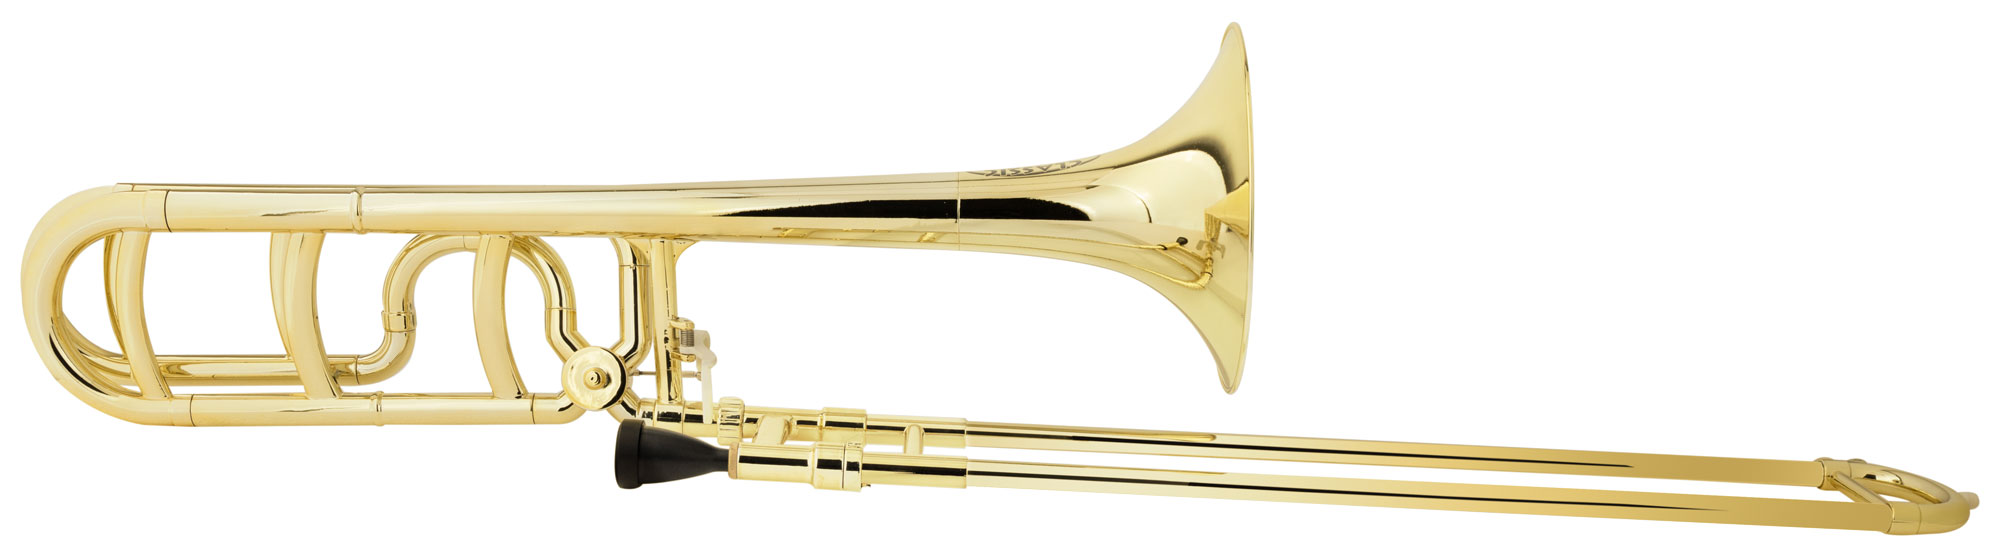 Posaunen - Classic Cantabile MardiBrass Kunststoff Bb|F Quartposaune gold - Onlineshop Musikhaus Kirstein